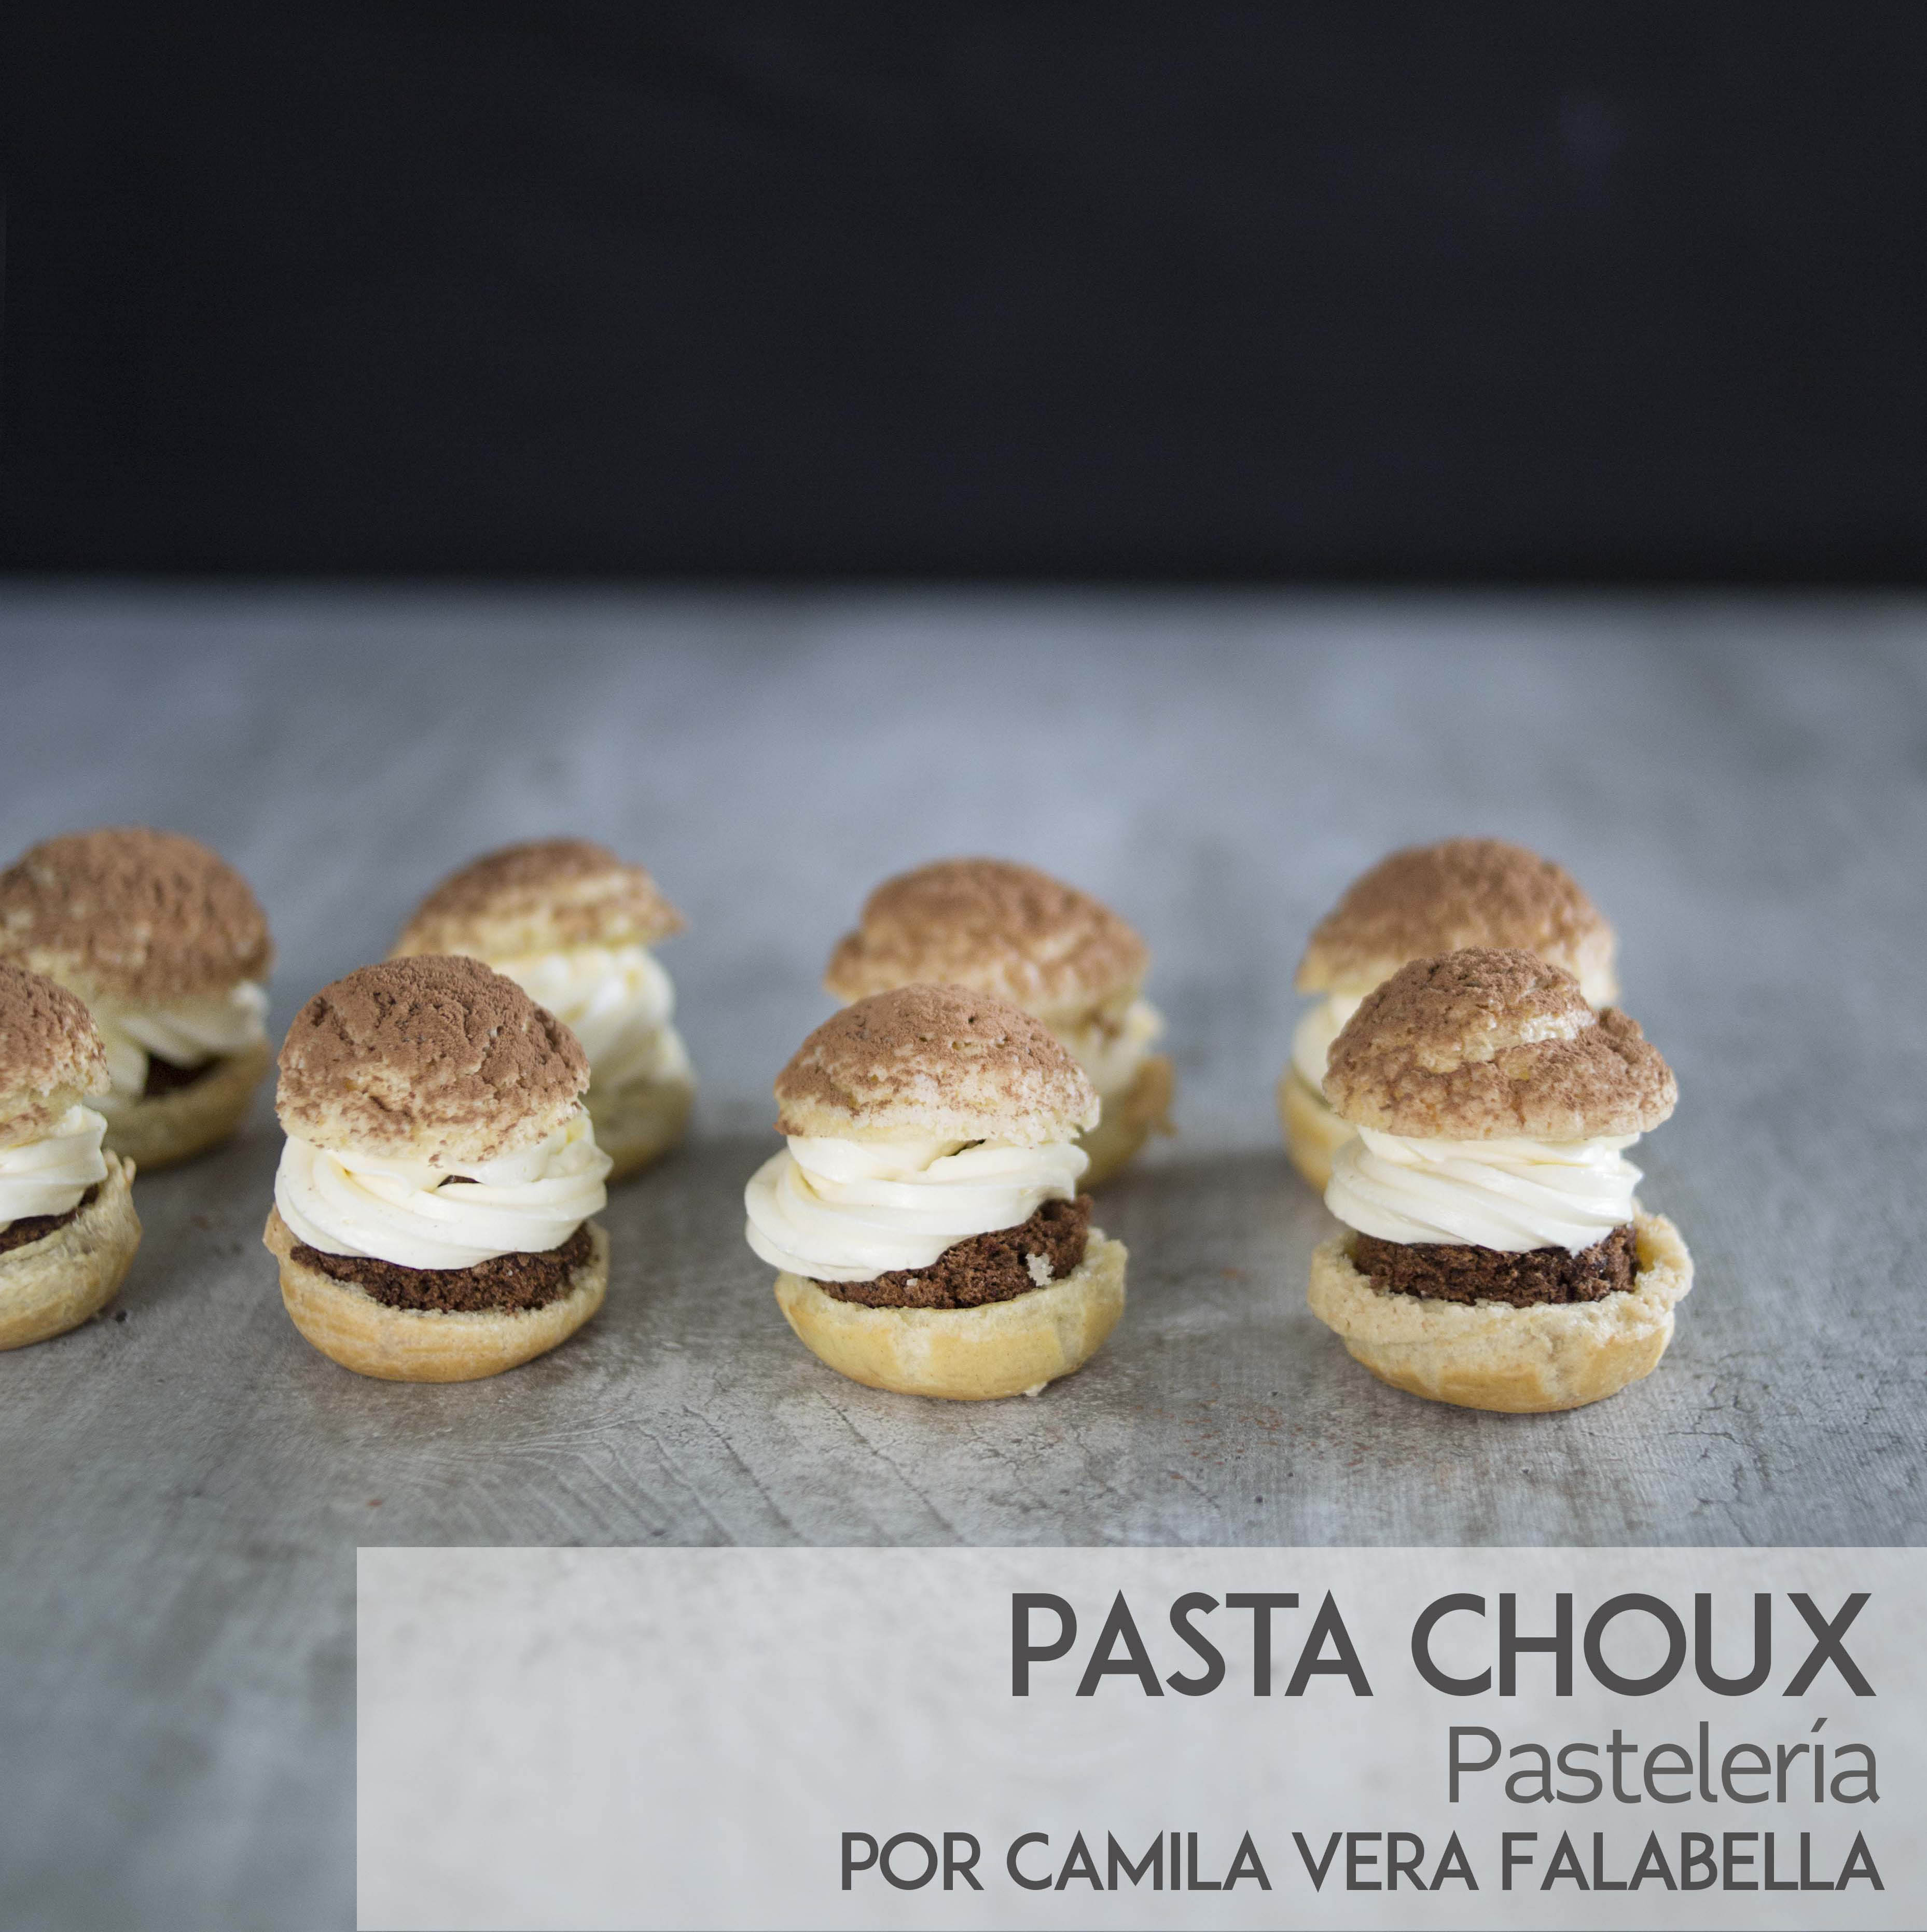 Pastachoux2